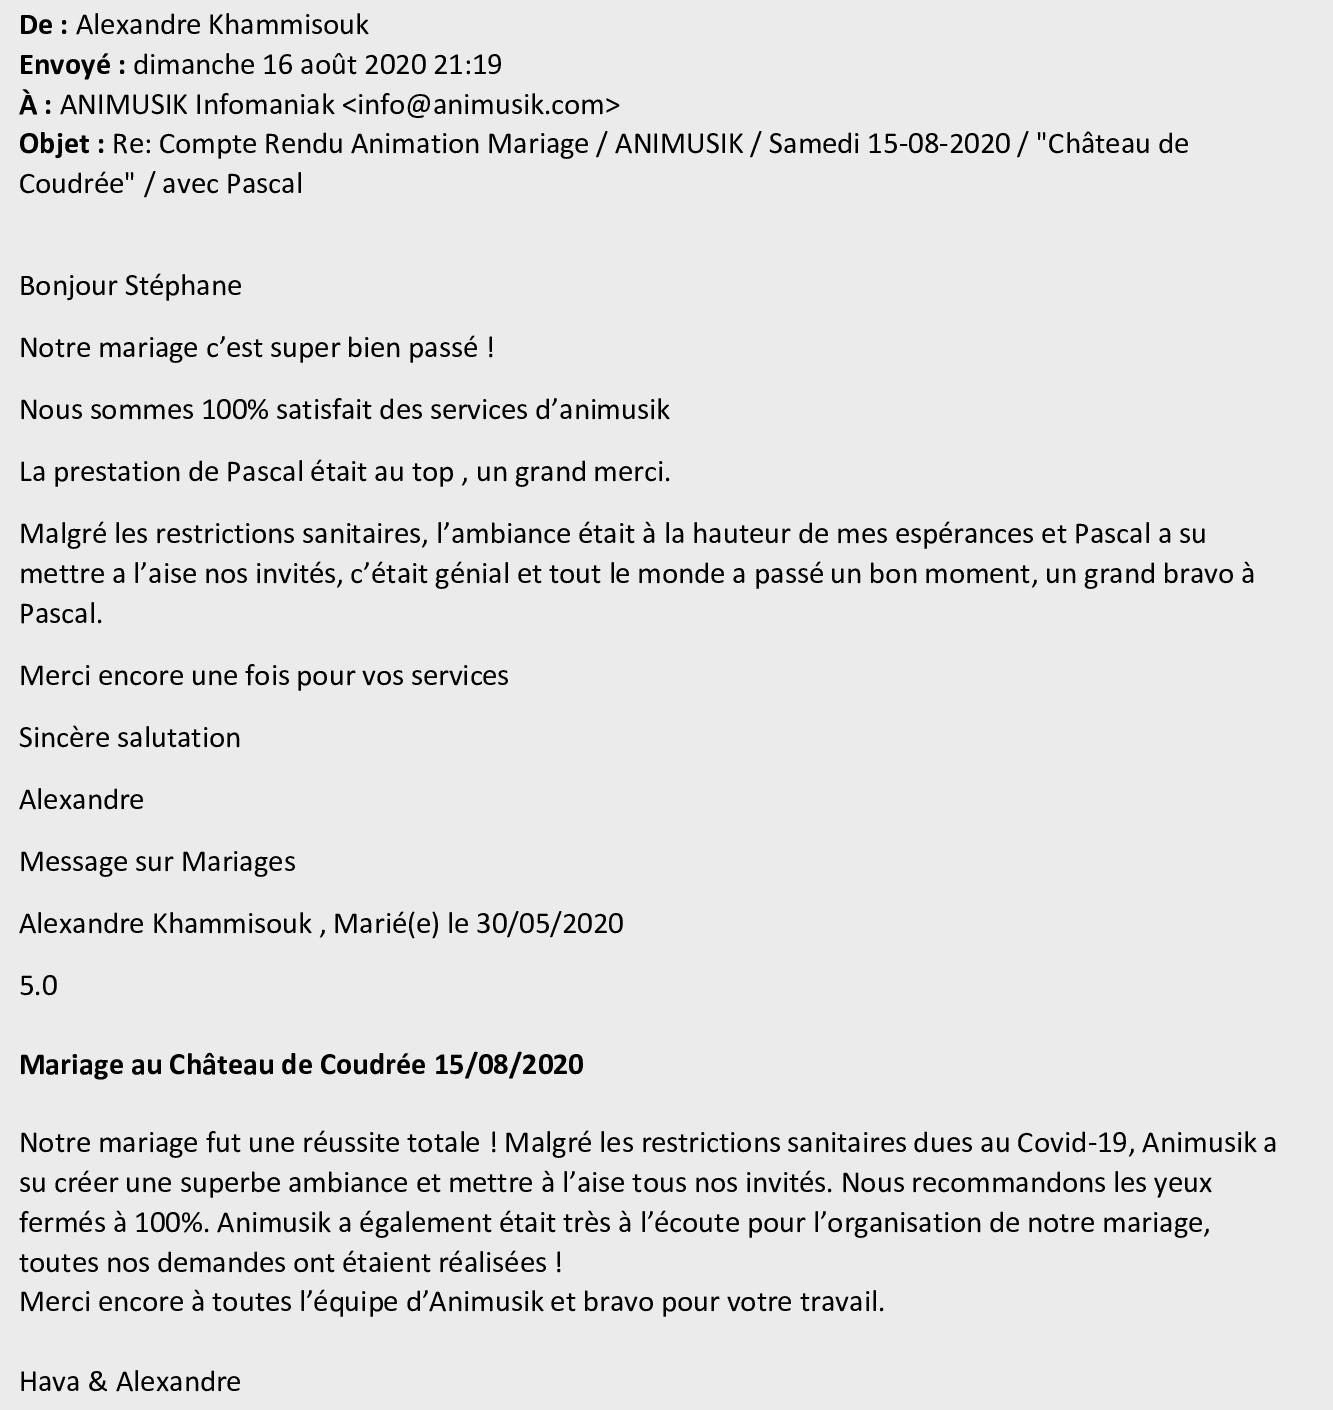 Mariage-KHAMMISOUK-Alexandre-_-KILIC-Hav